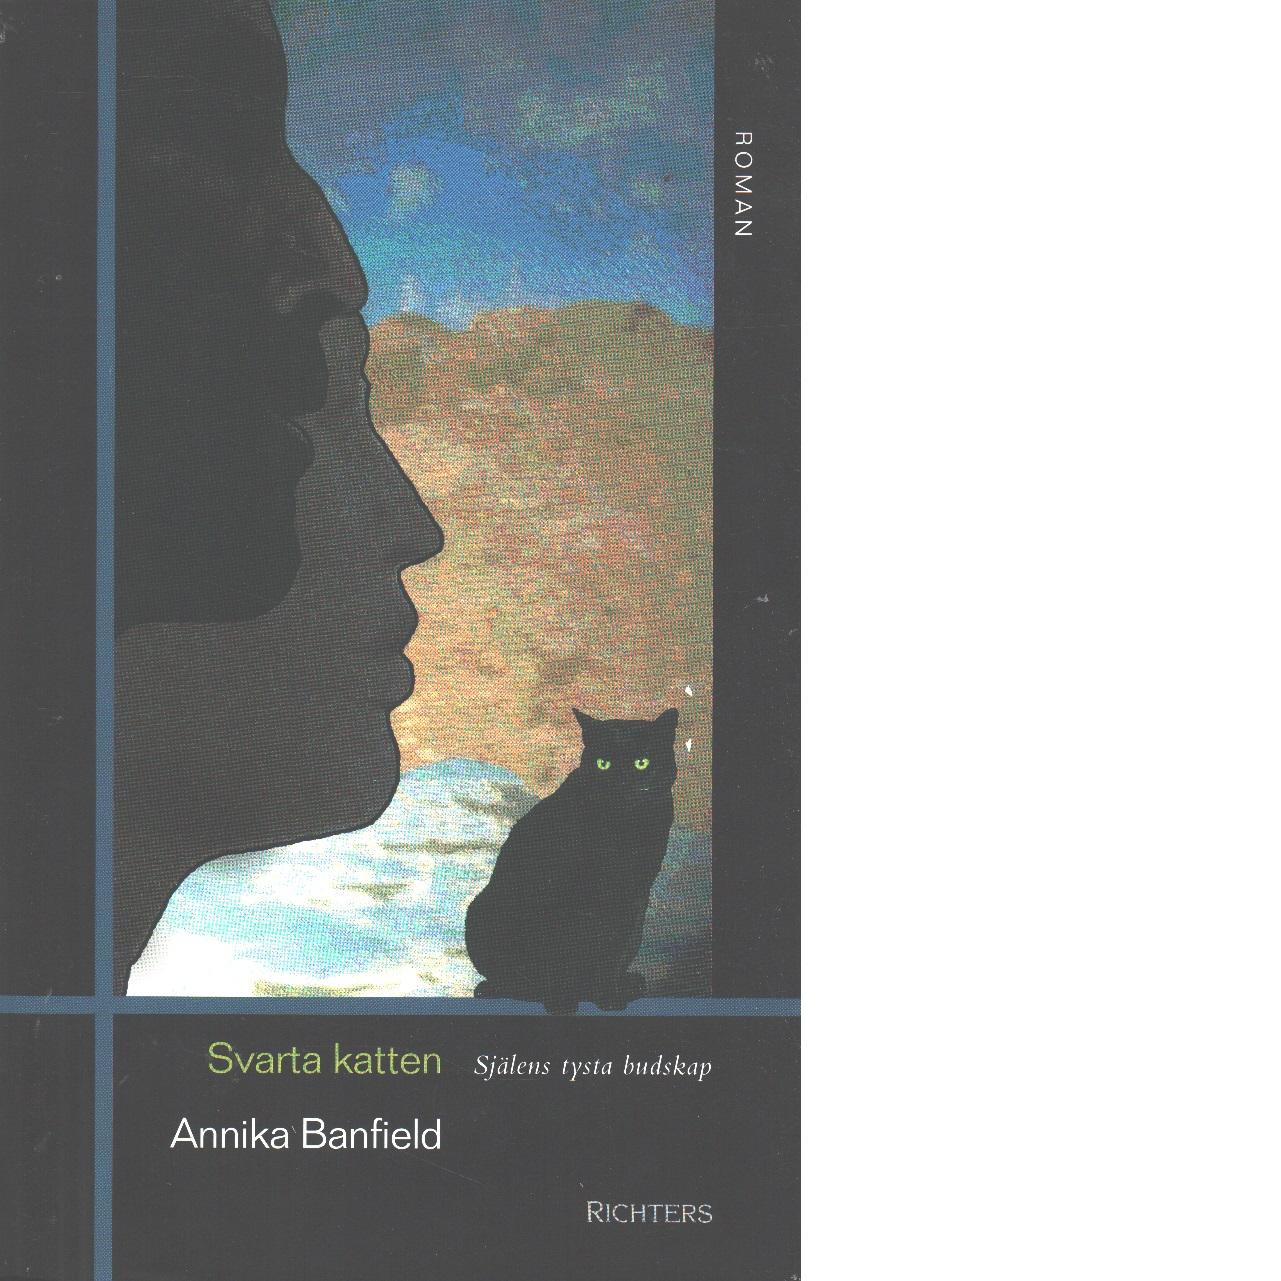 Svarta katten : själens tysta budskap - Banfield, Annika